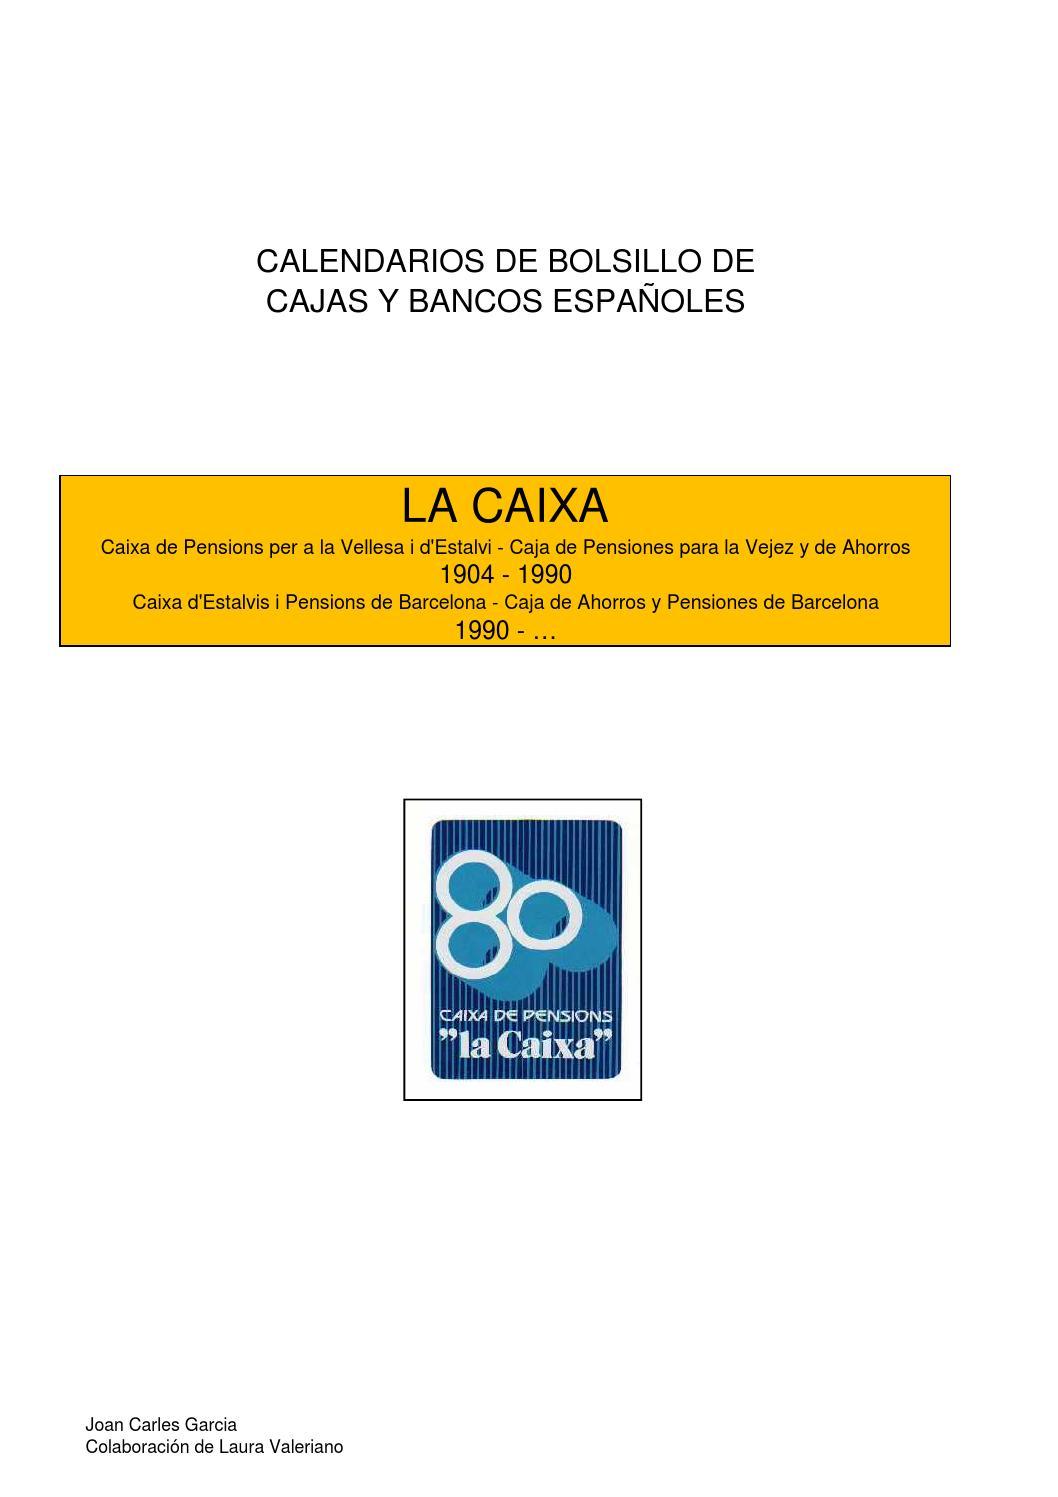 La caixa by foro tapon corona issuu - Caixa d estalvis i pensions de barcelona oficinas ...